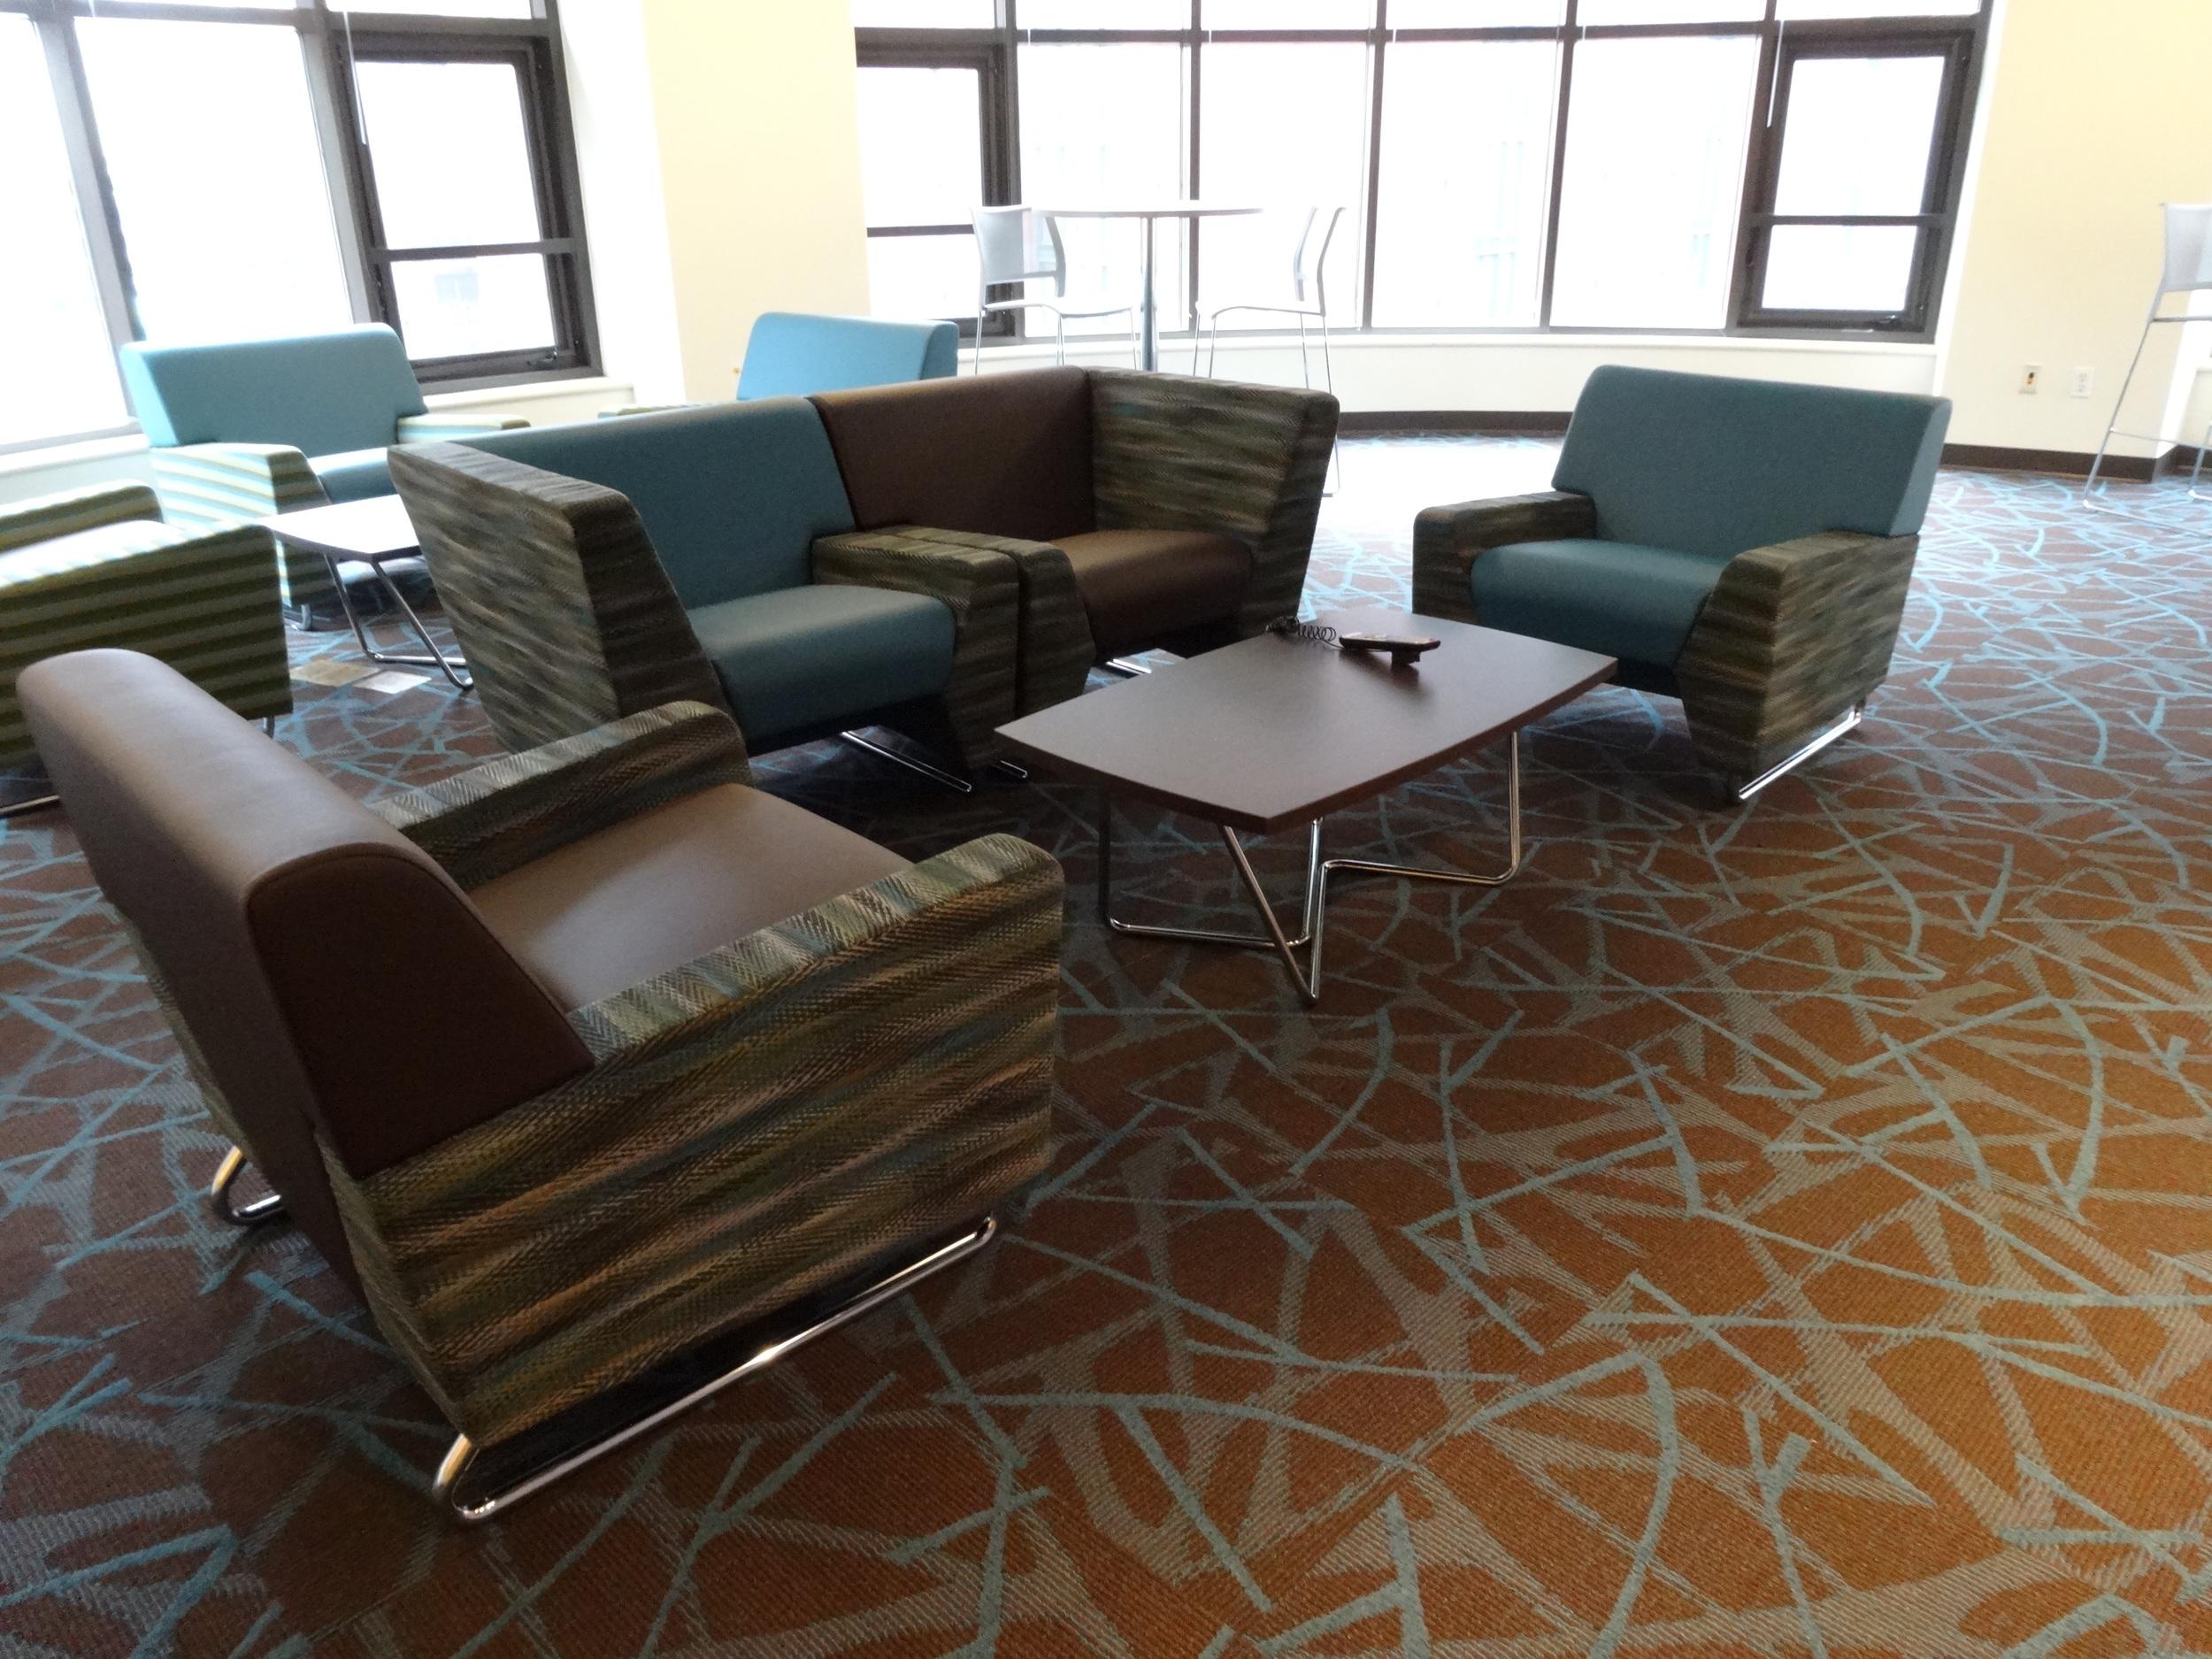 new lounge furniture 2016 026.JPG